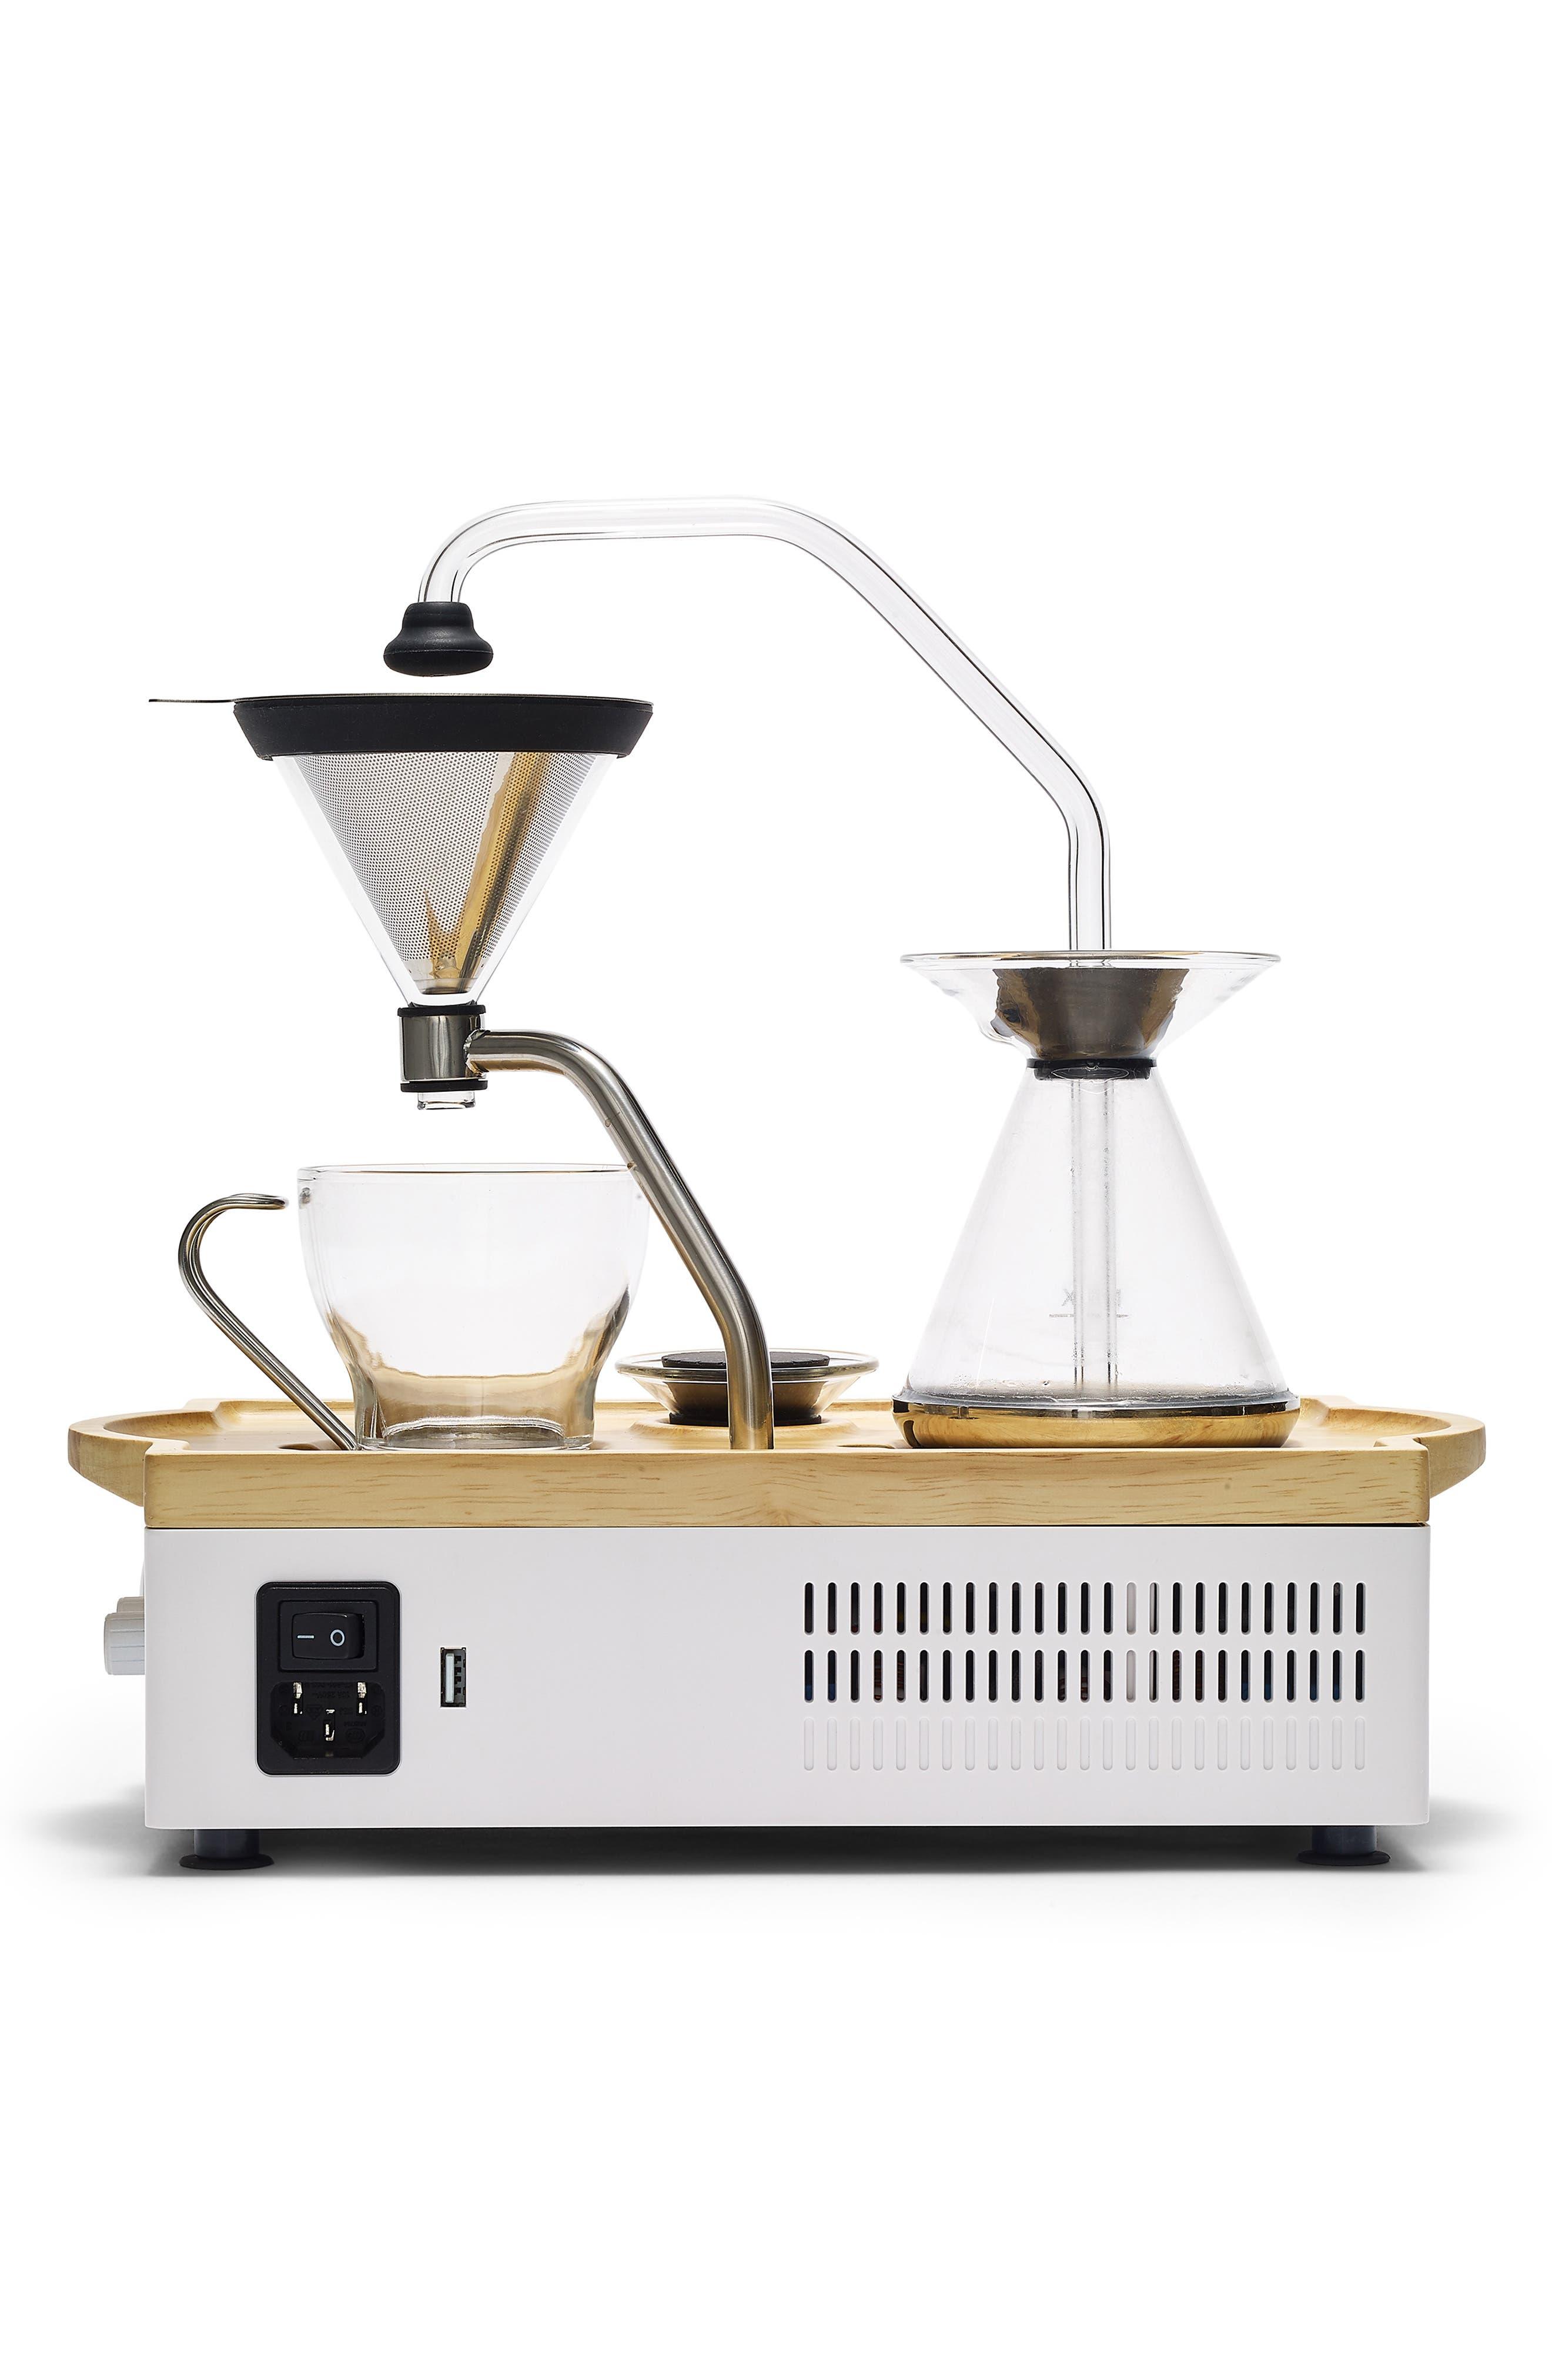 Soda Says x Barisieur Coffee & Tea Alarm Clock,                             Alternate thumbnail 2, color,                             WHITE/ RUBBERWOOD